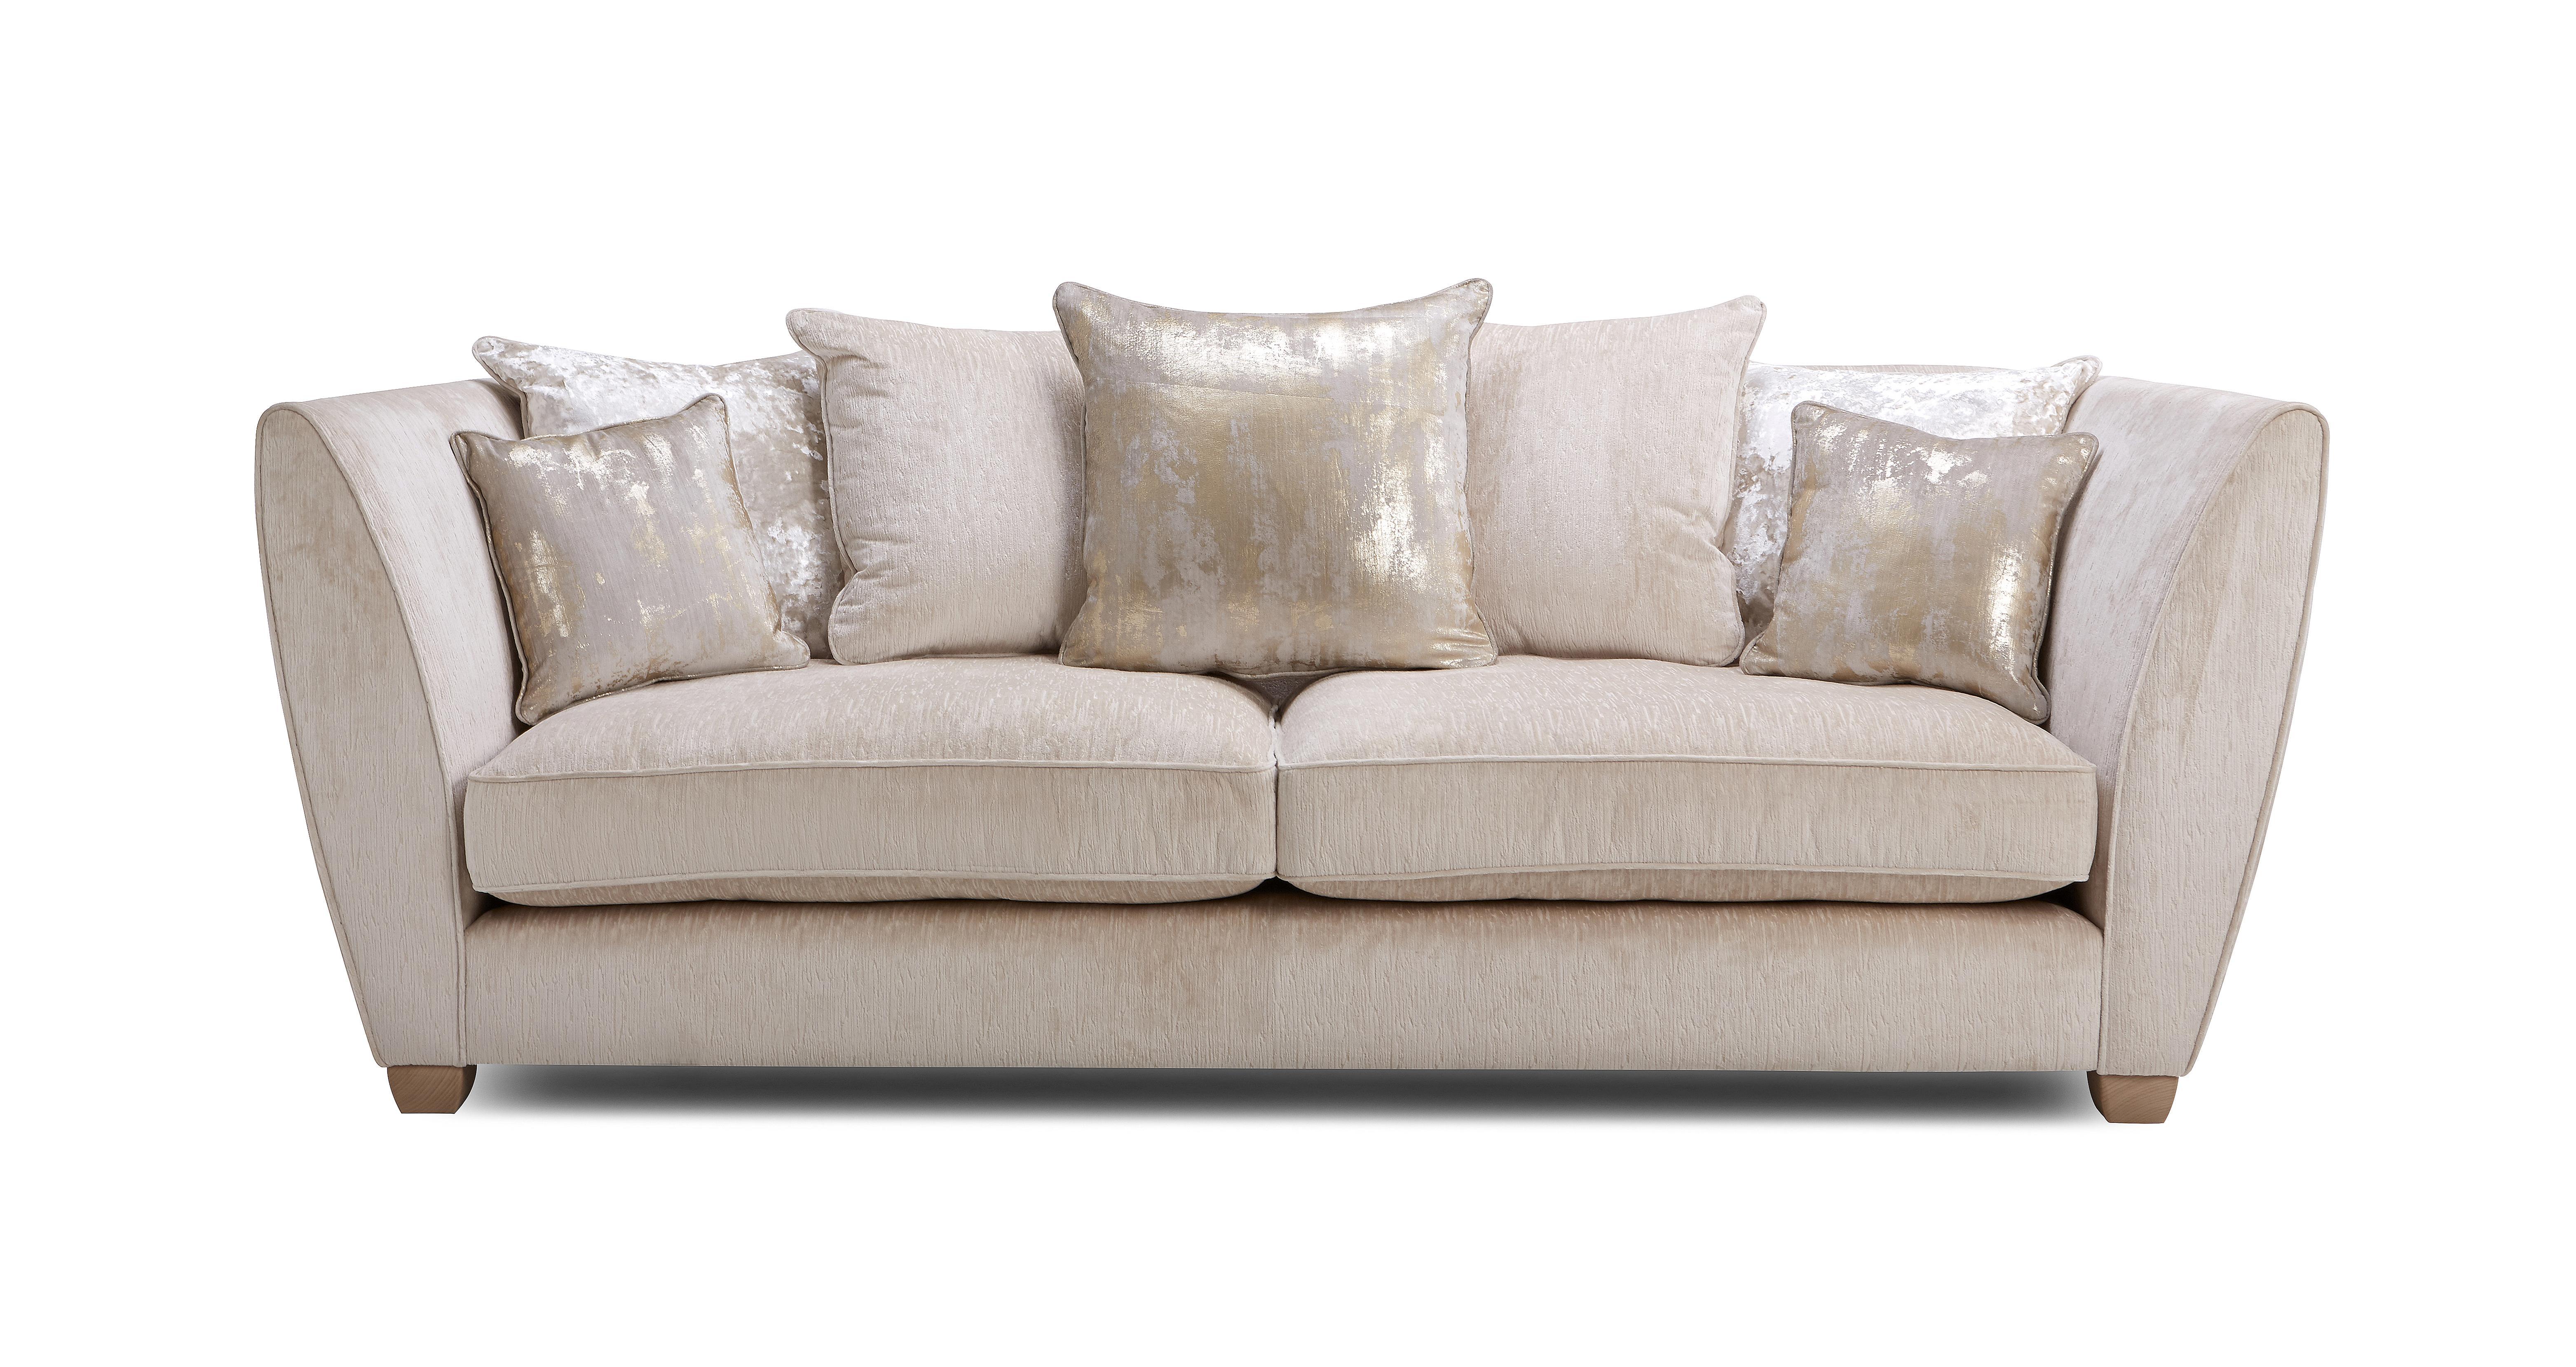 big sofa 240 cm beautiful owco with big sofa 240 cm big. Black Bedroom Furniture Sets. Home Design Ideas